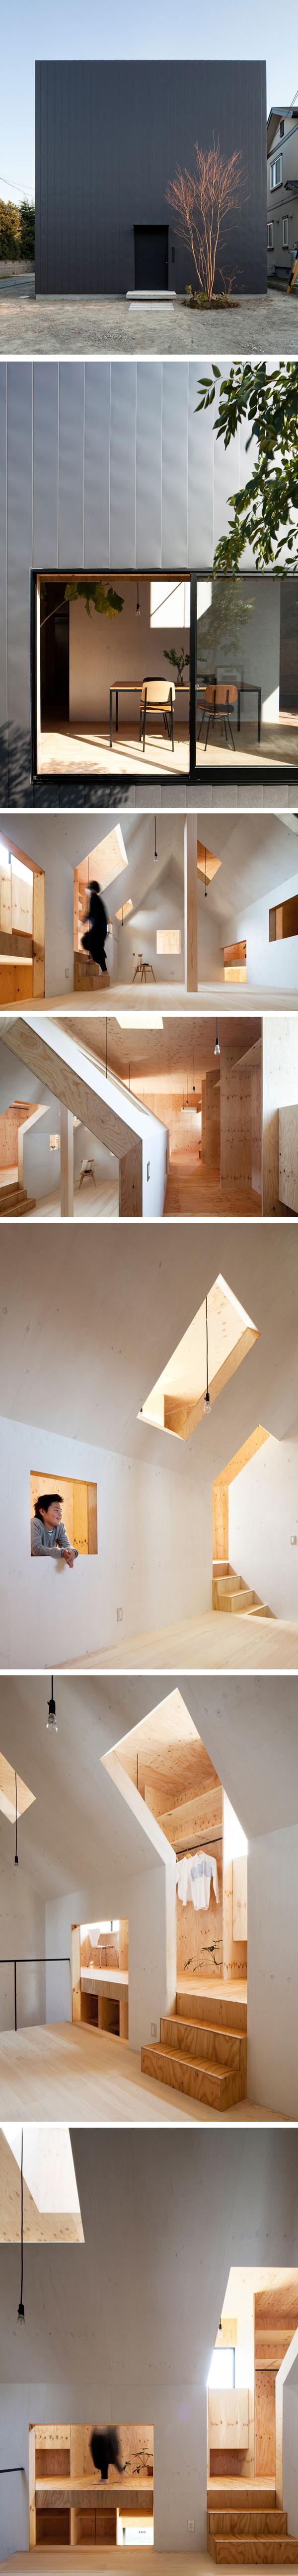 Ant house